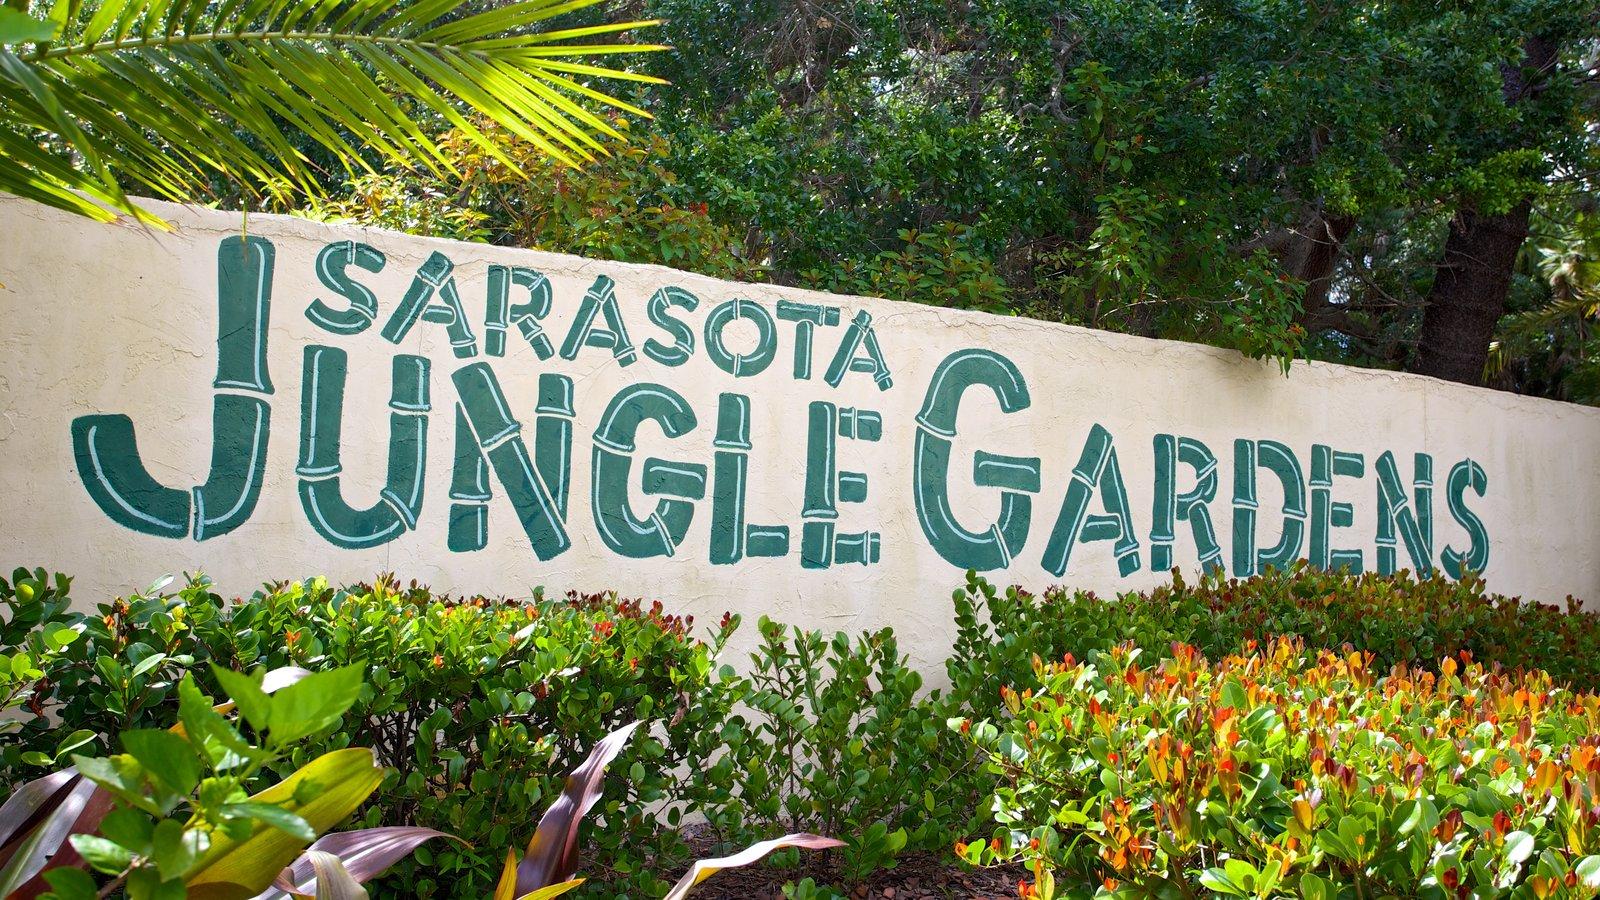 Sarasota Jungle Gardens Pictures View Photos Images Of